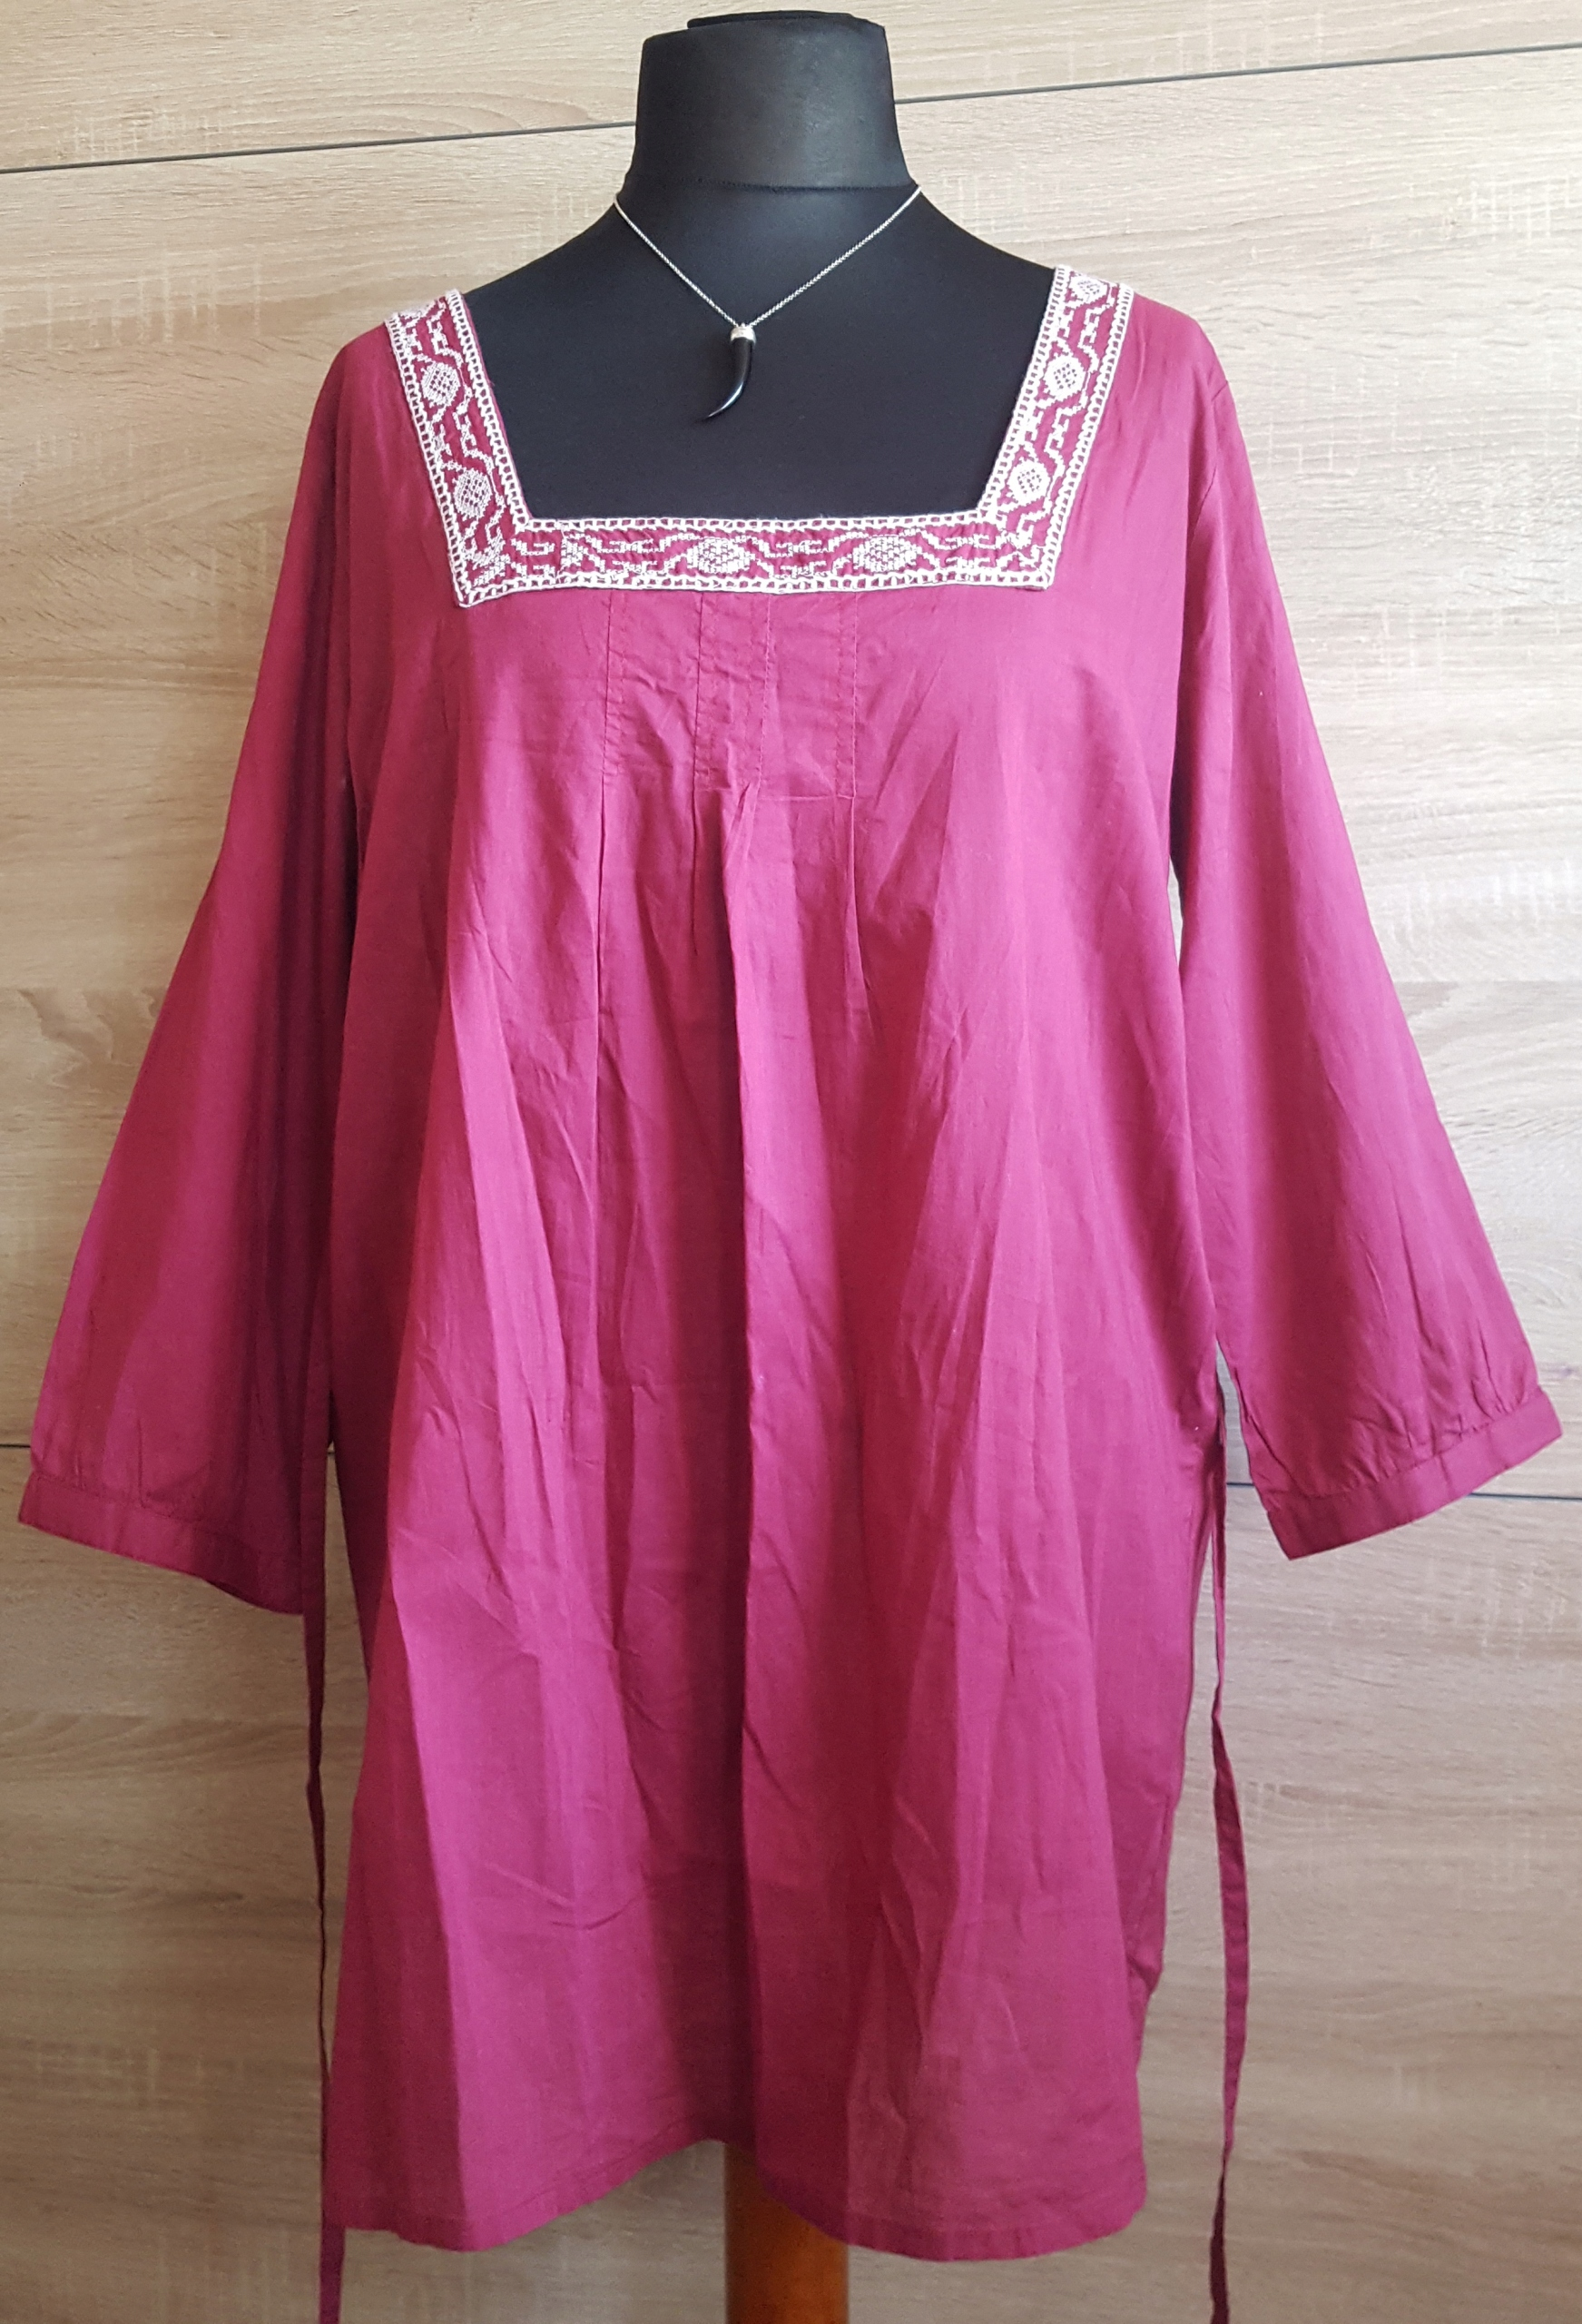 Bluzka damska GLAMOROSA duży rozmiar 50.